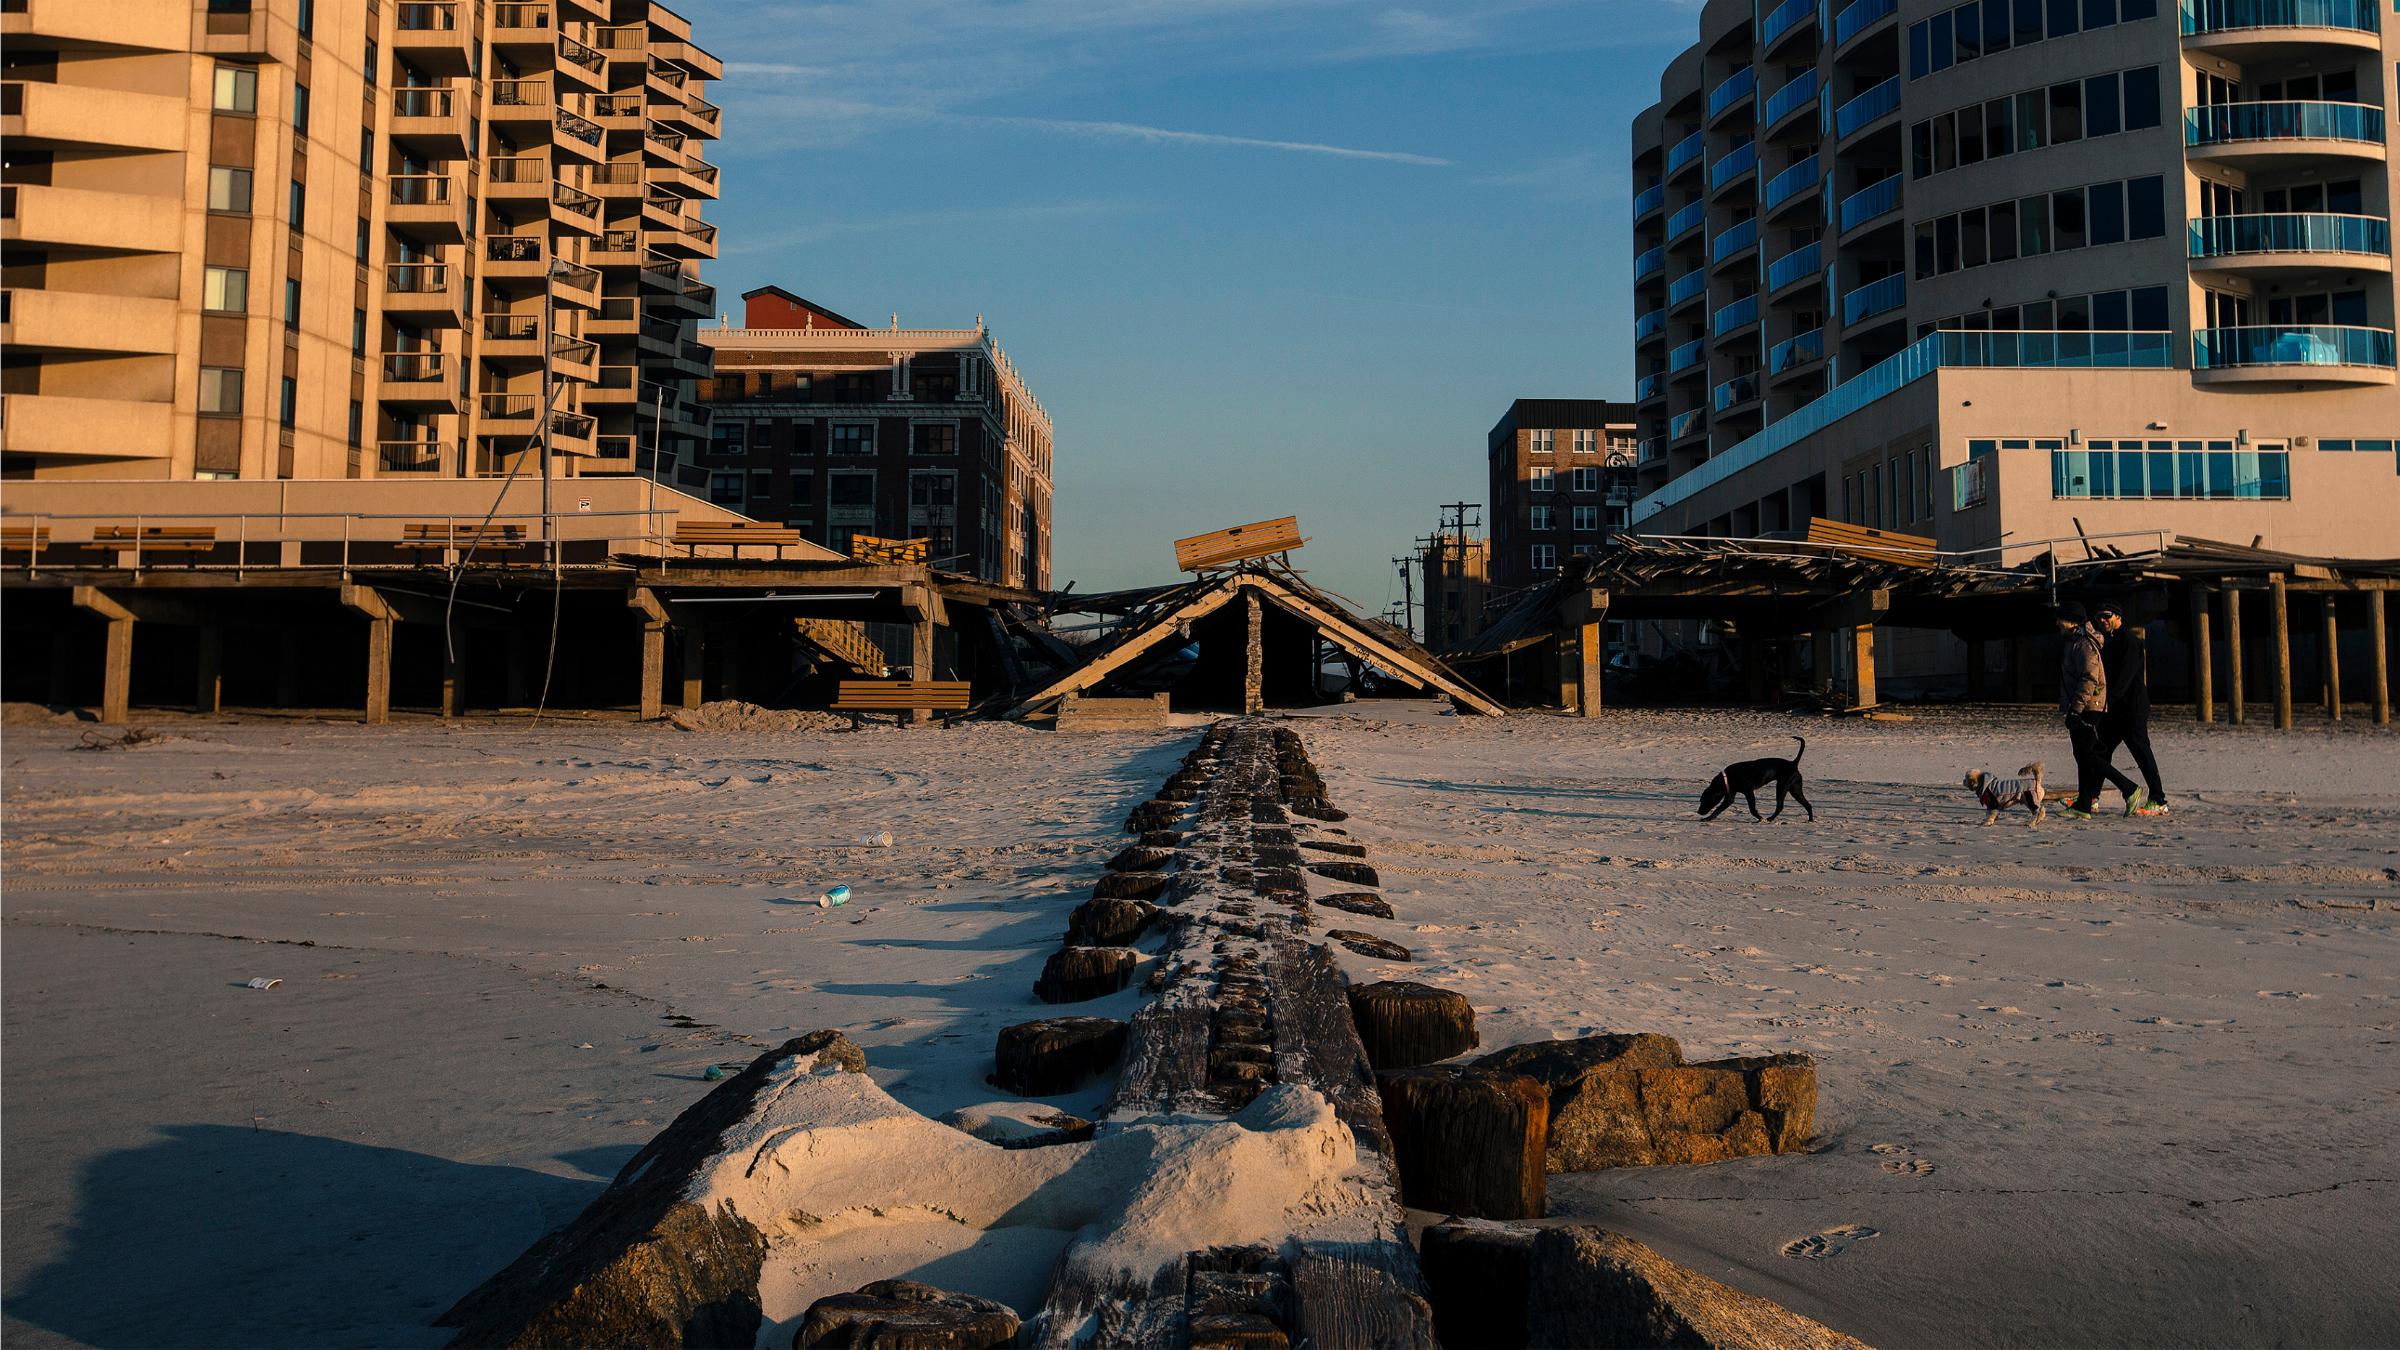 Sandy-battered boardwalk